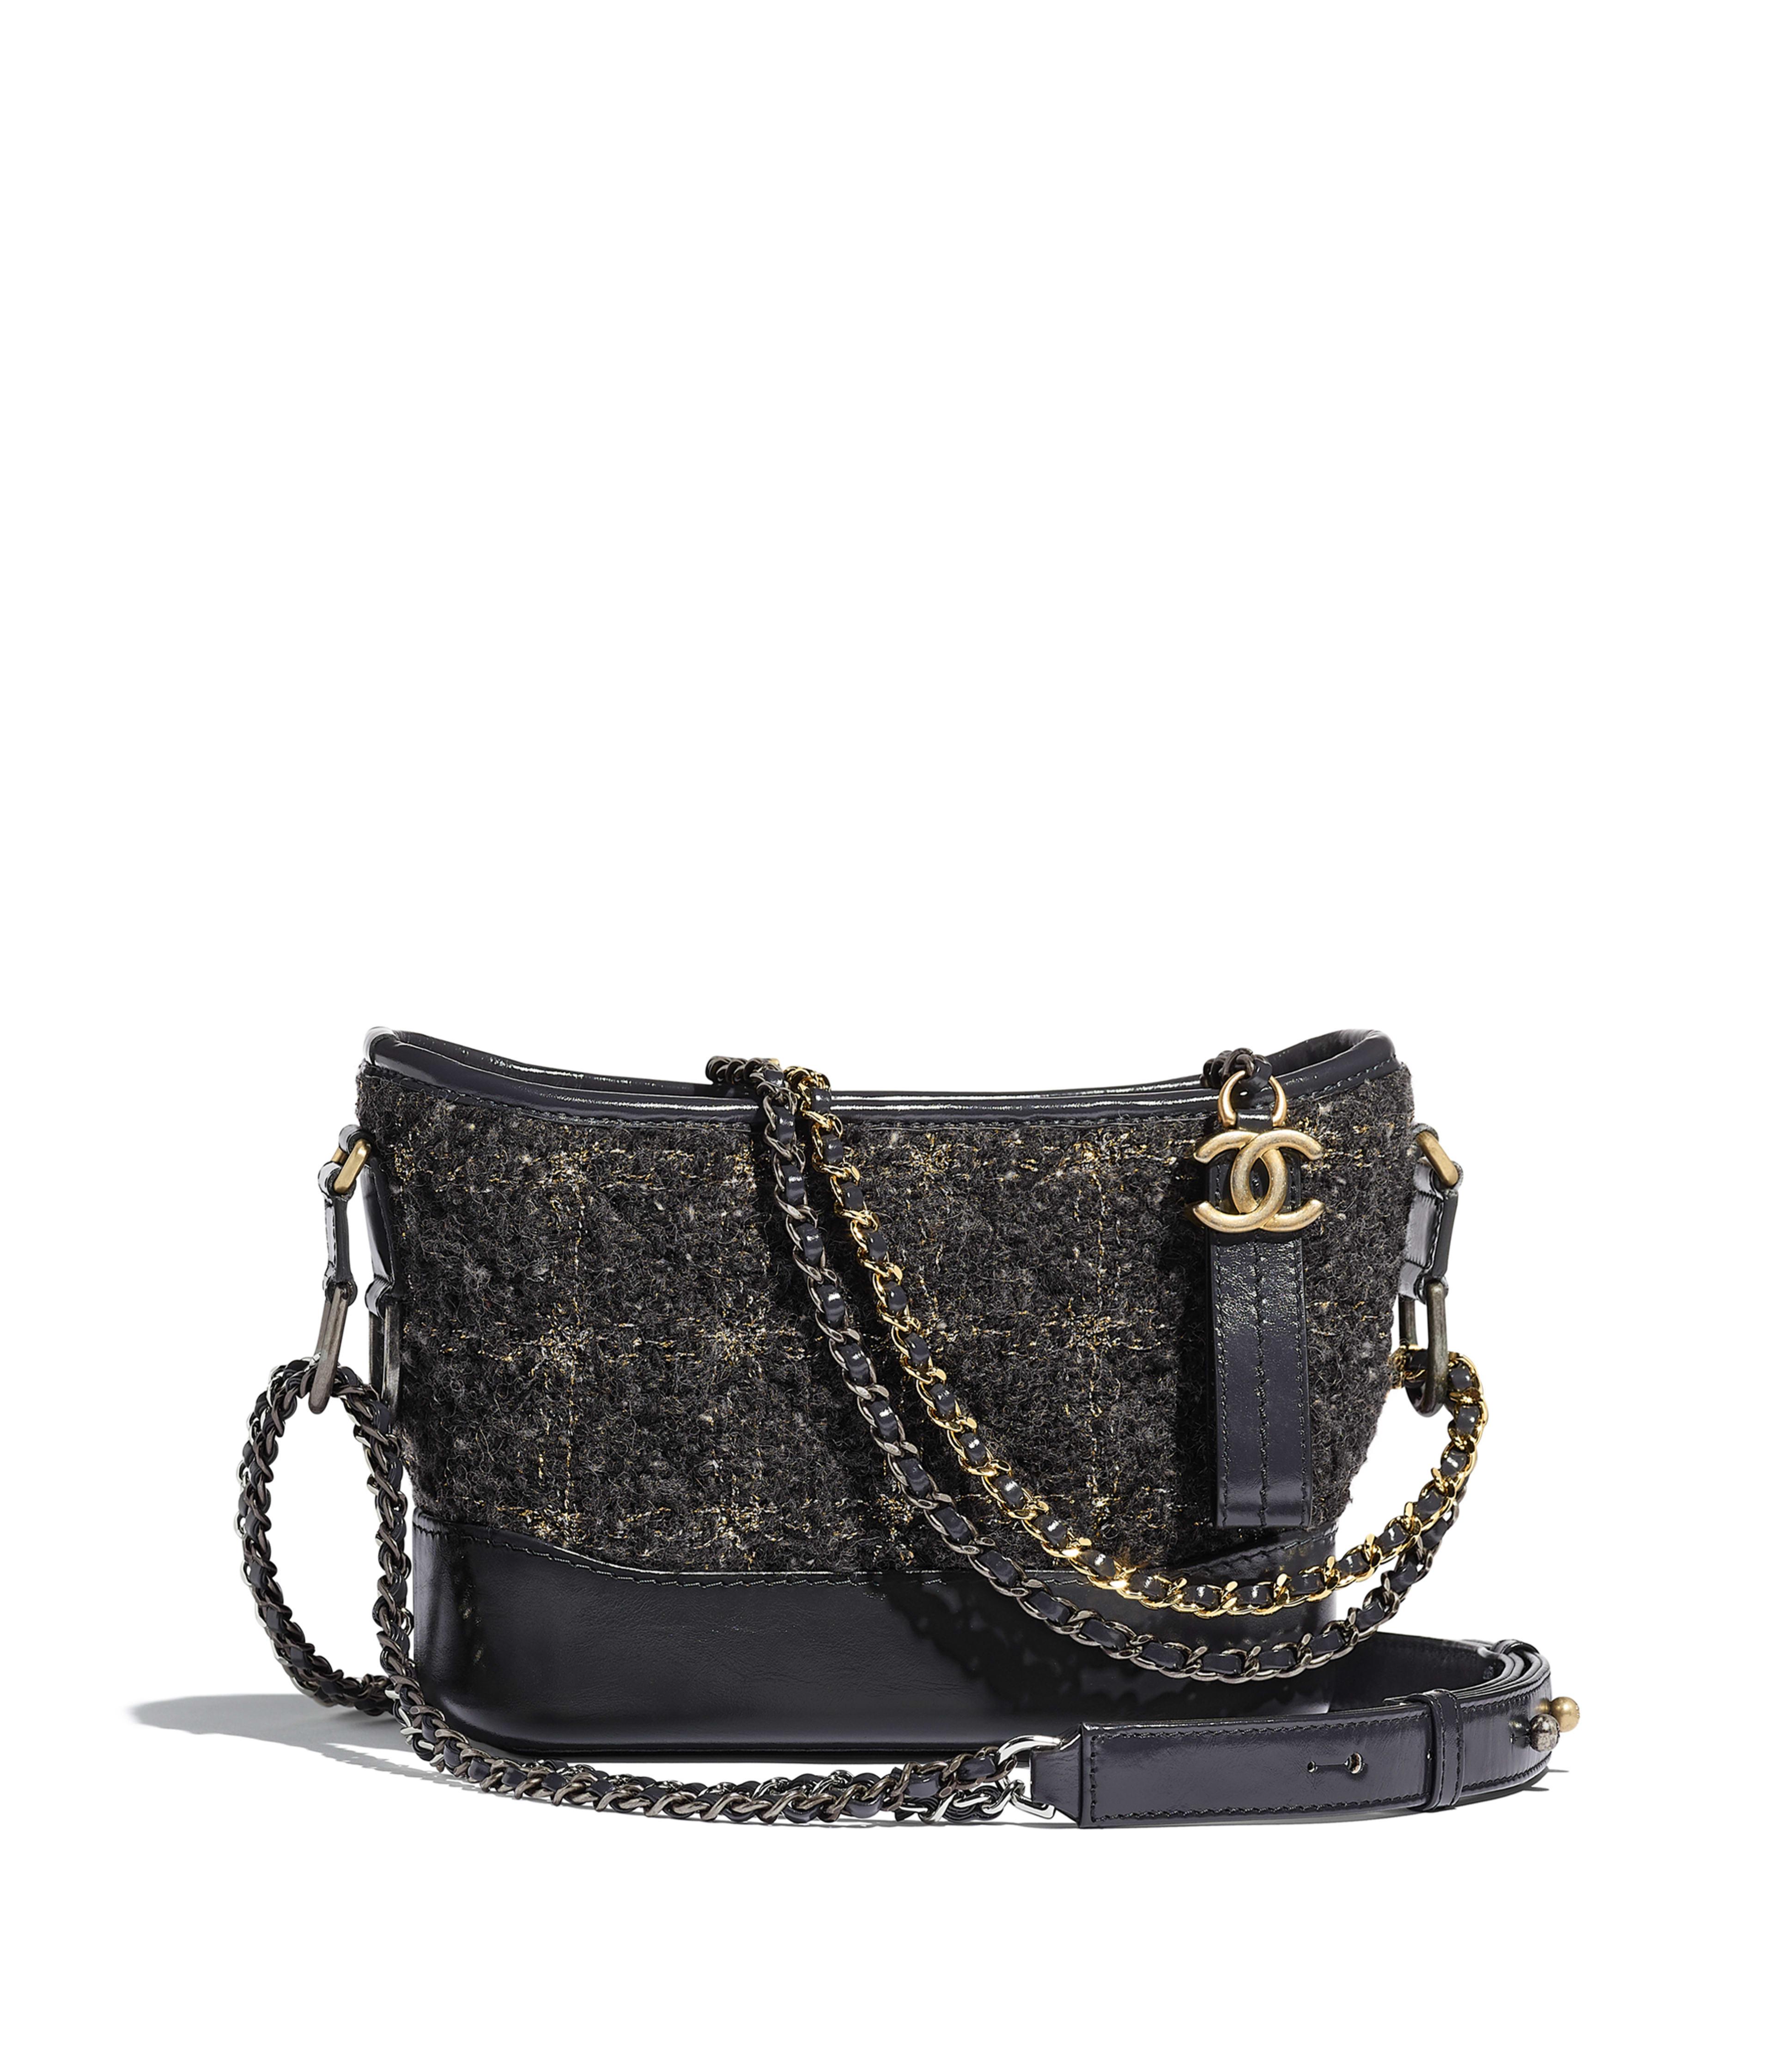 Hobo Bags Handbags Chanel